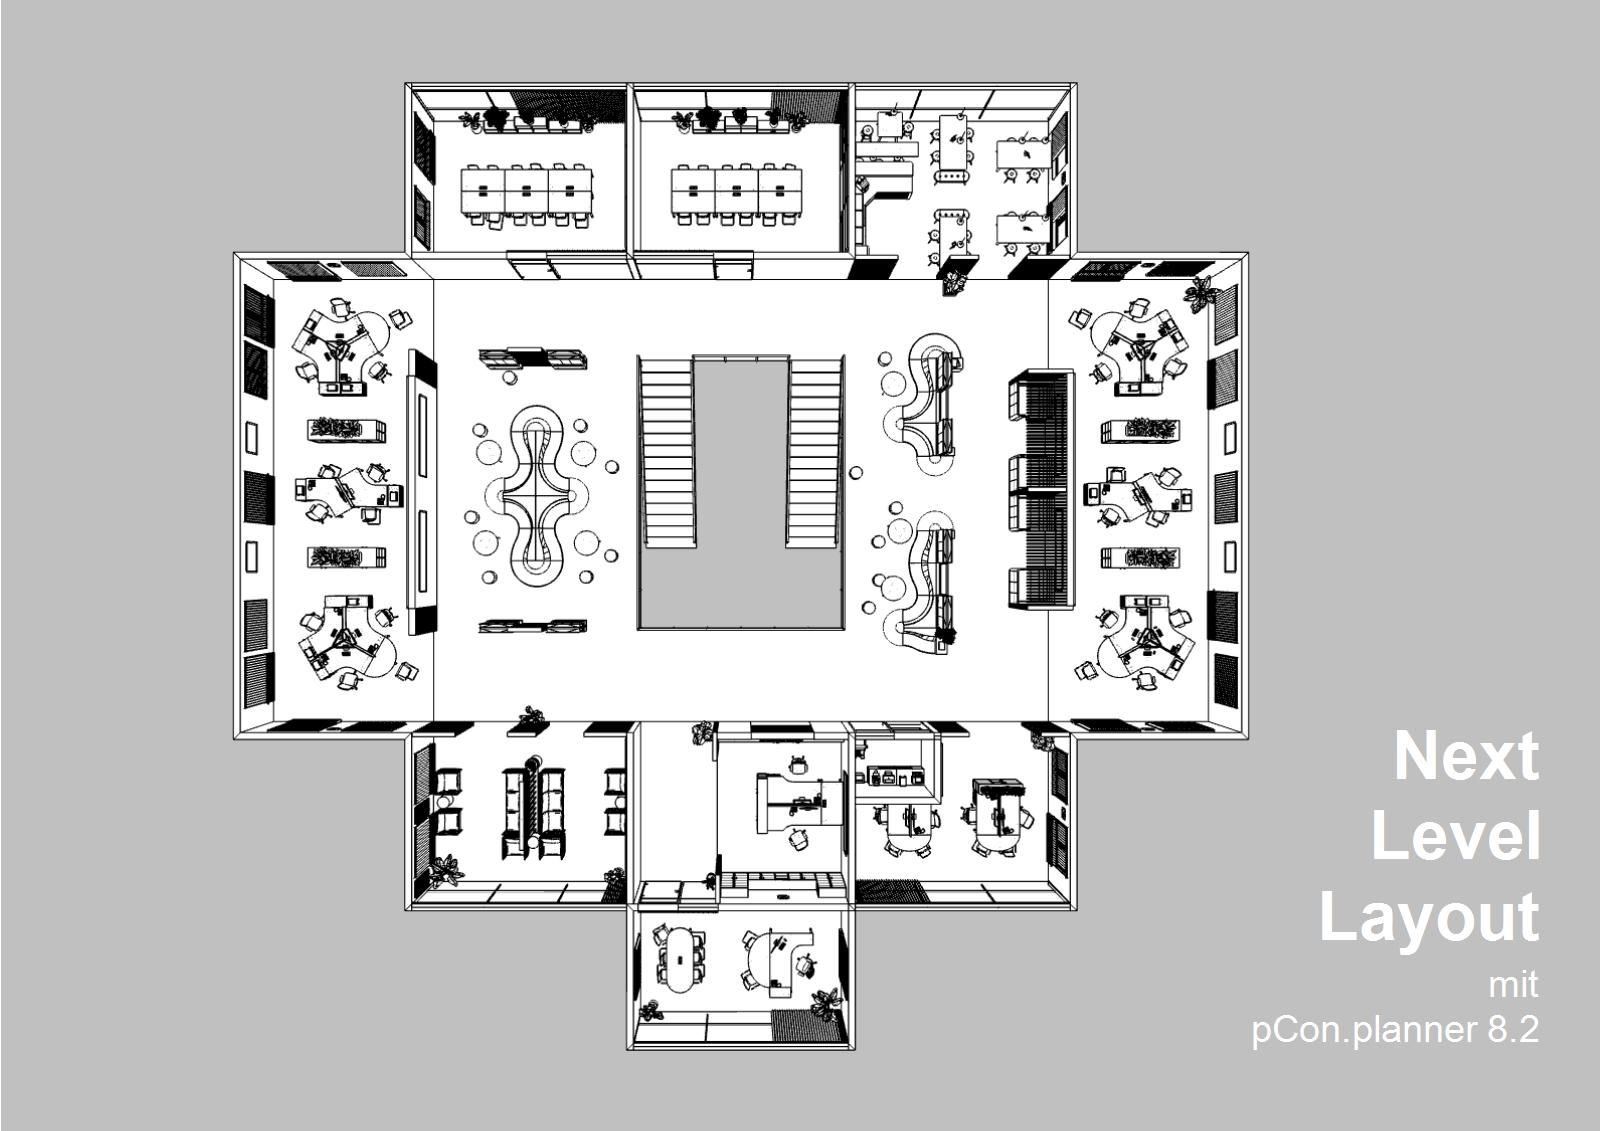 pCon.planner 8.2 – Next Level Layout PDF pCon.planner 8.2 layout